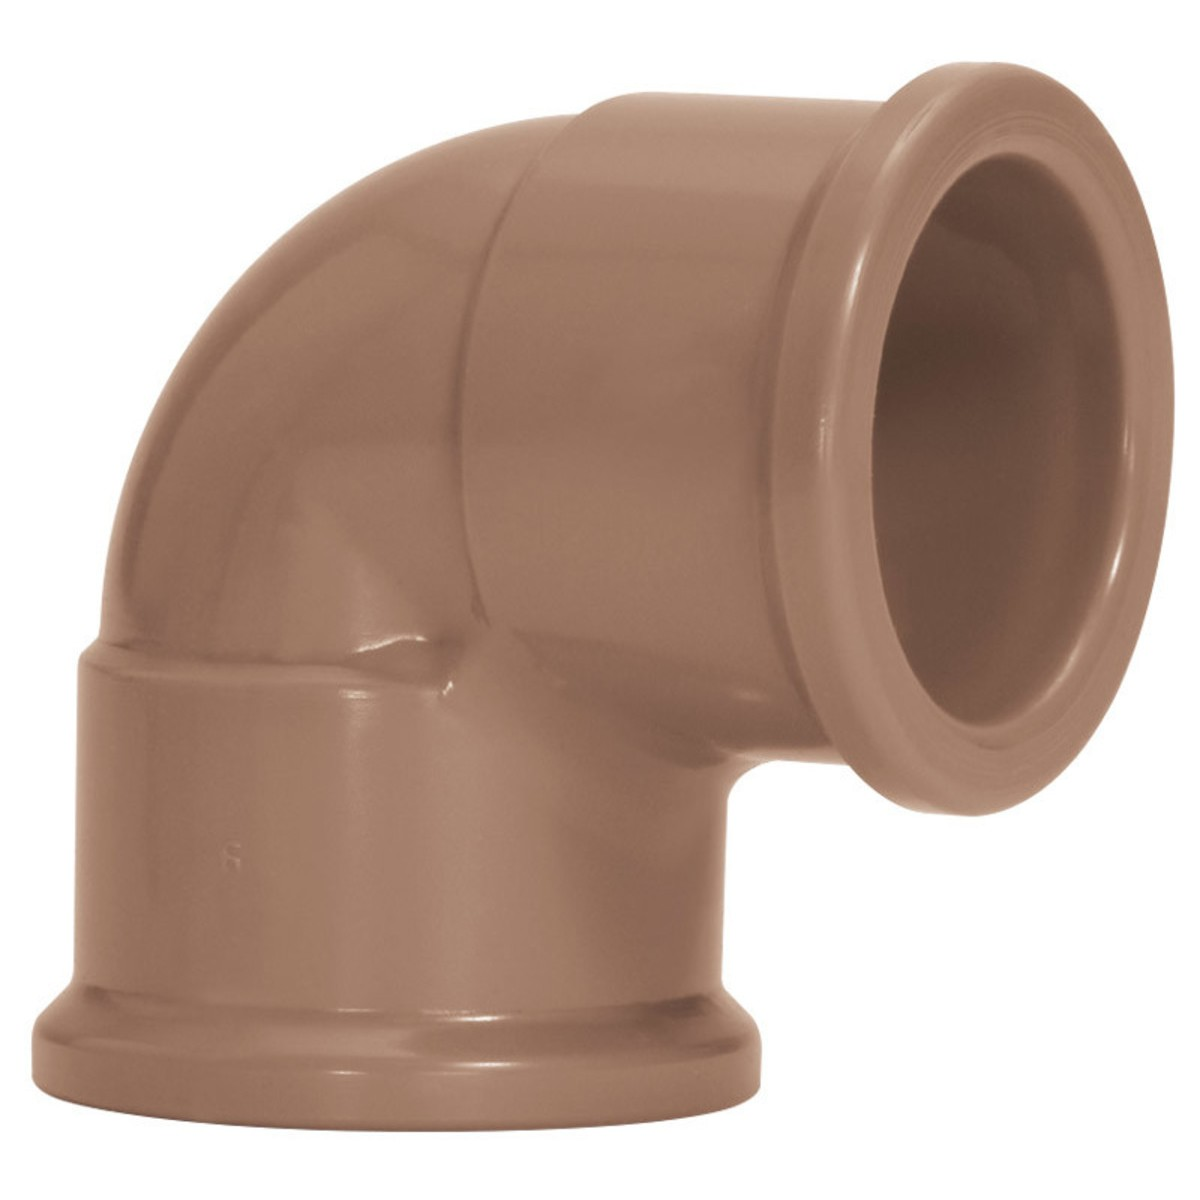 Joelho 90 Soldavel PVC Marrom 20 mm - Amanco